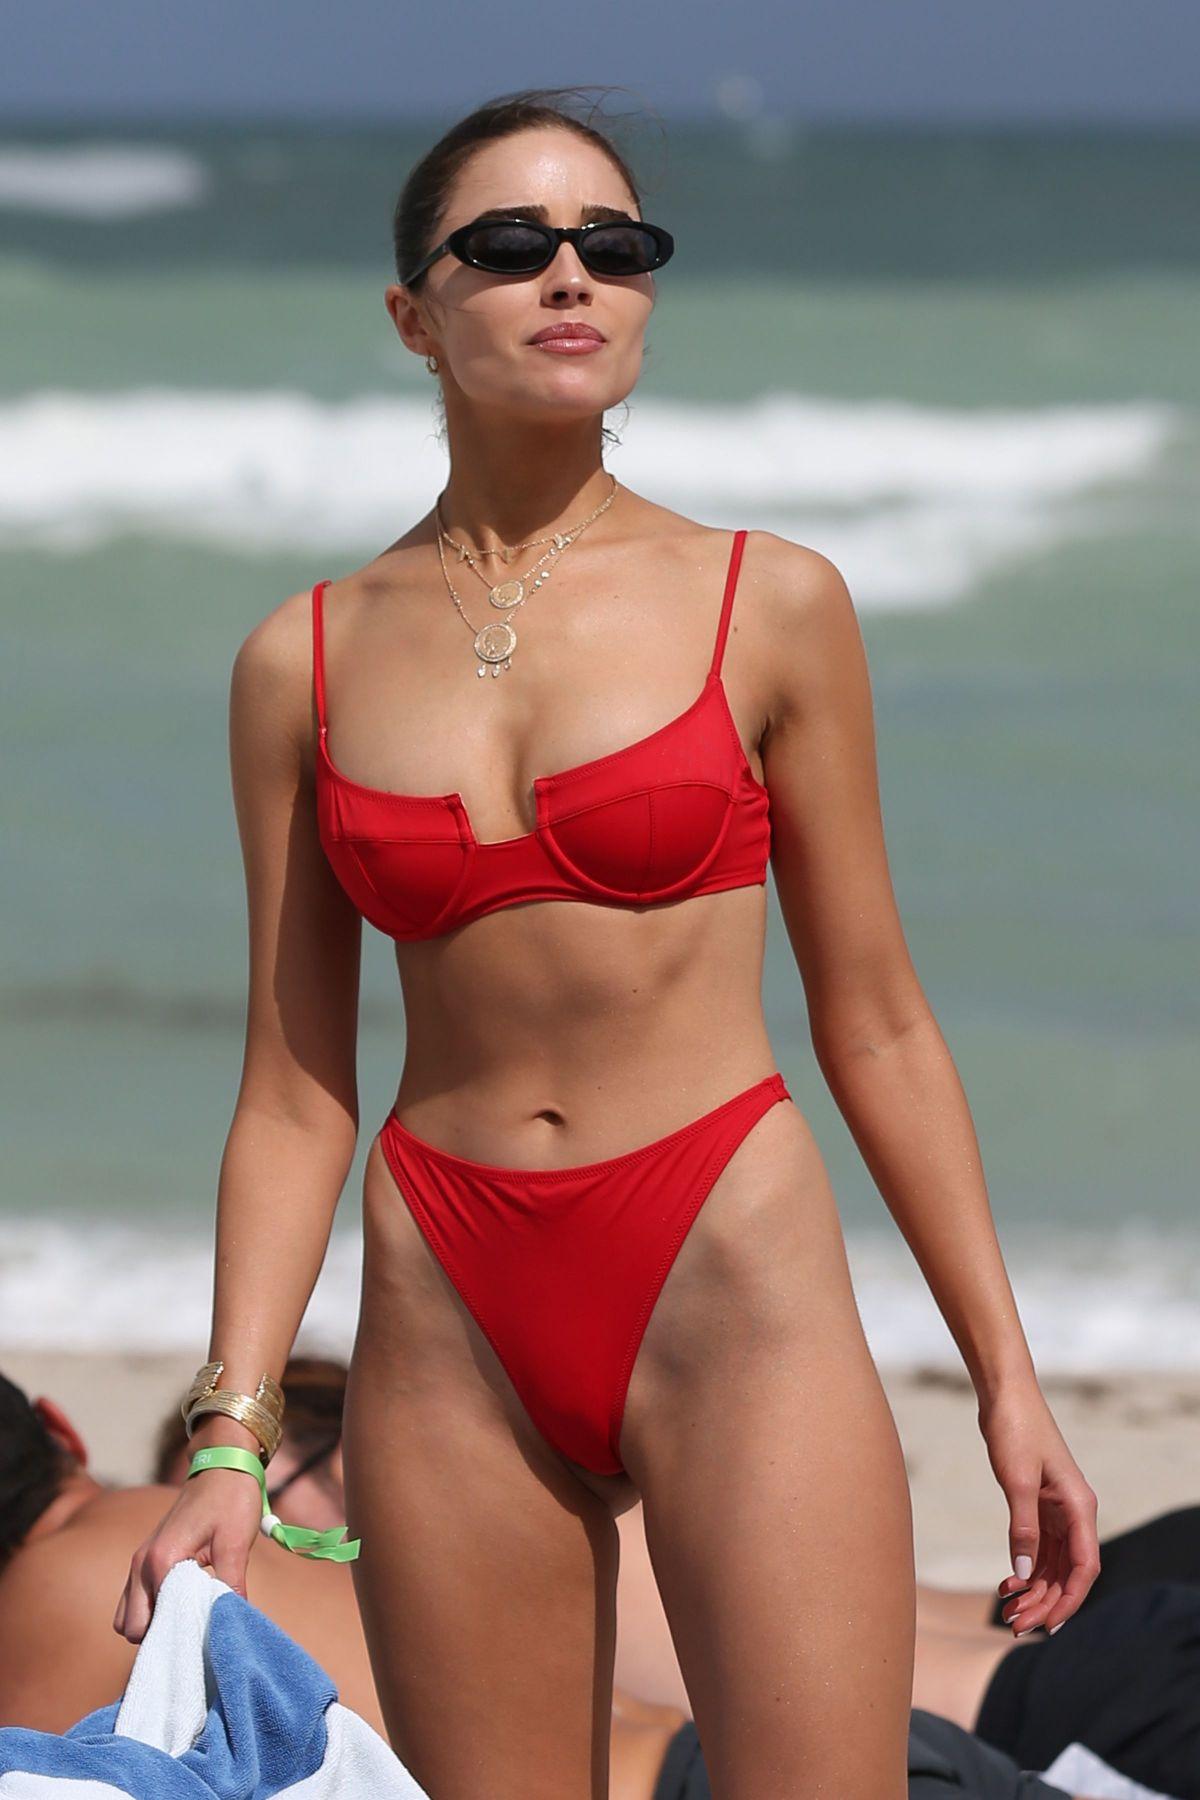 fd154d37170 OLIVIA CULPO in a Red Bikini at a Beach in Miami 03/28/2019 – HawtCelebs